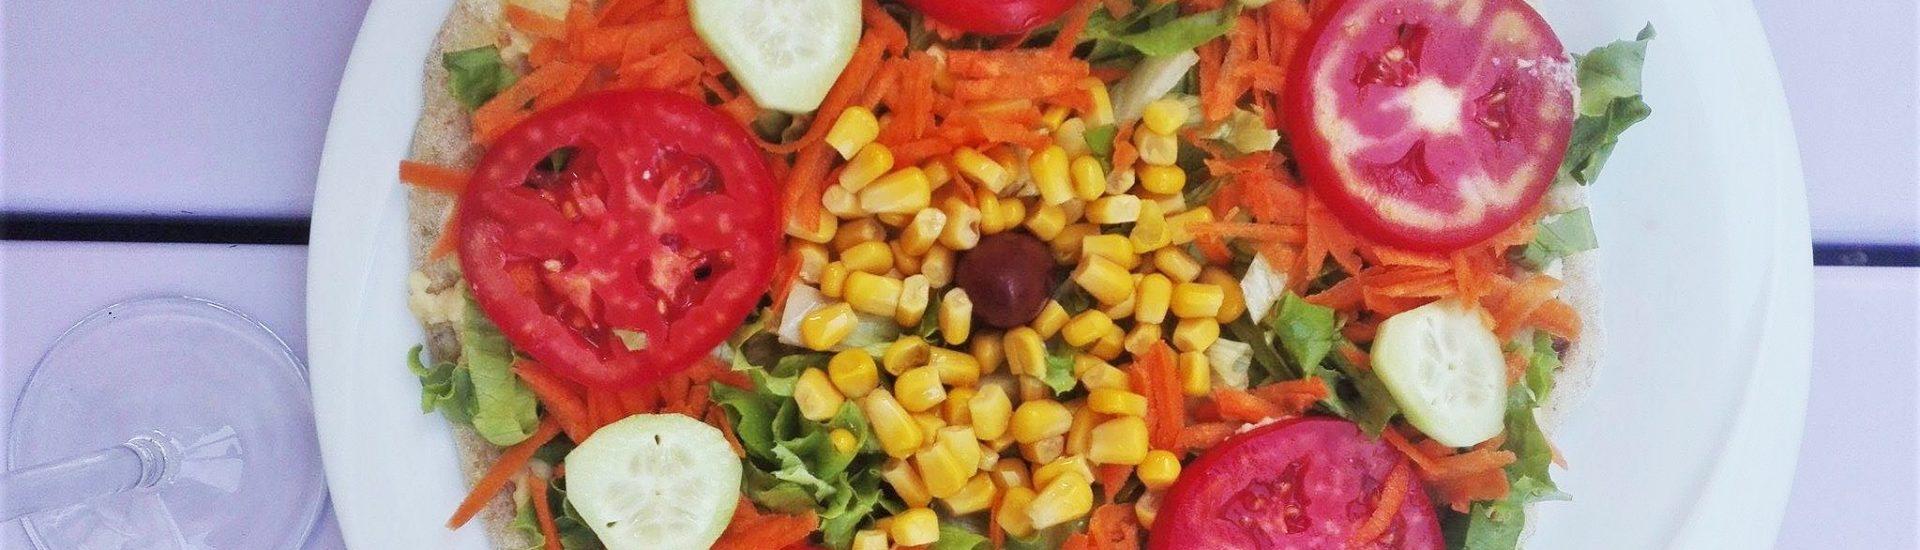 ristoranti vegani croazia pol parenzo rovigno